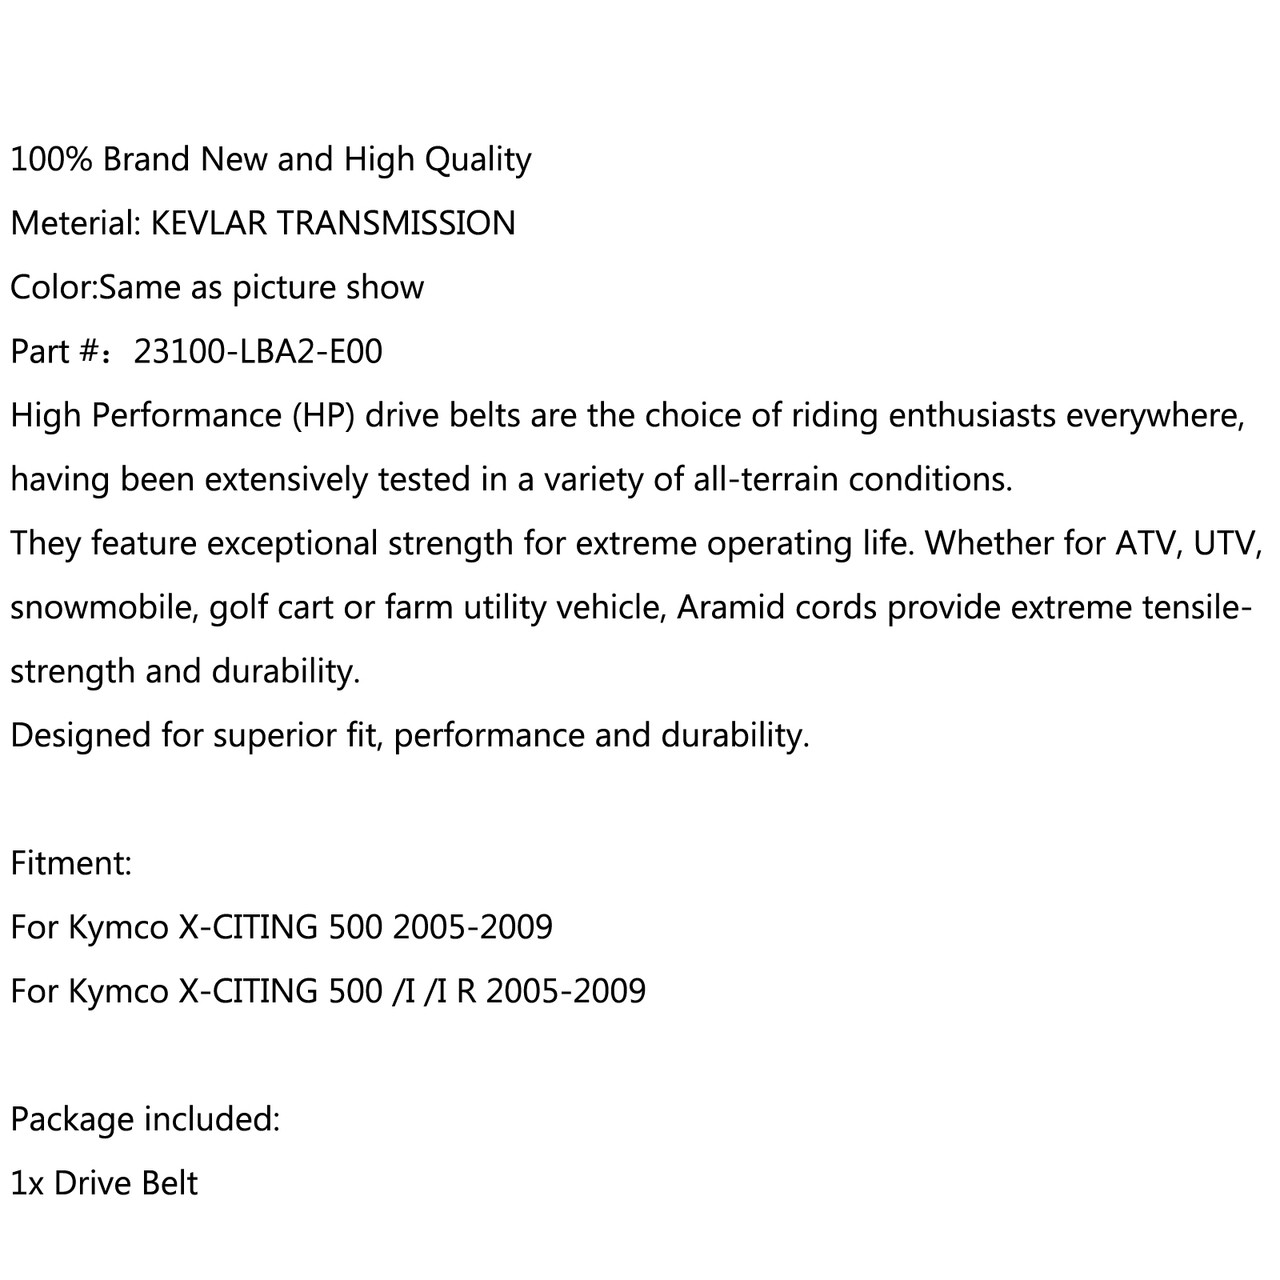 Drive Belt 23100-LBA2-E00 For Kymco X-CITING 500 Kymco X-CITING 500 /I /I R (2005-2009) Black